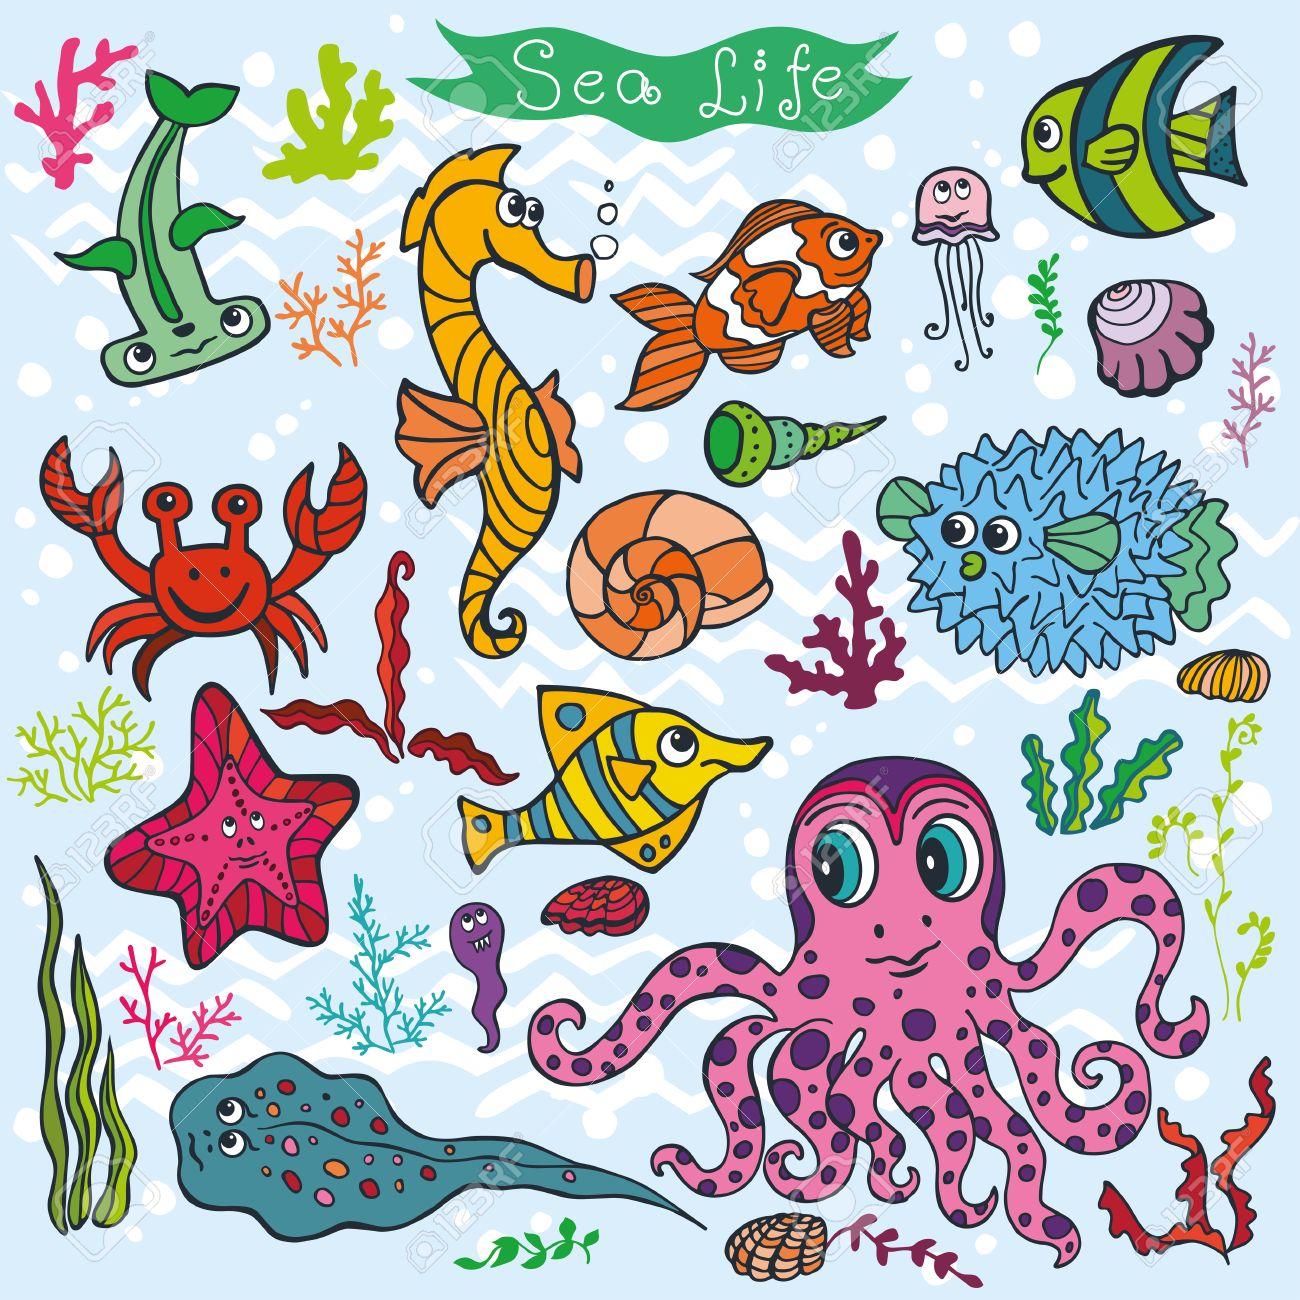 1300x1300 Sea Life Animals Set Fish, Octopus, Crab, Seahorse With Coral